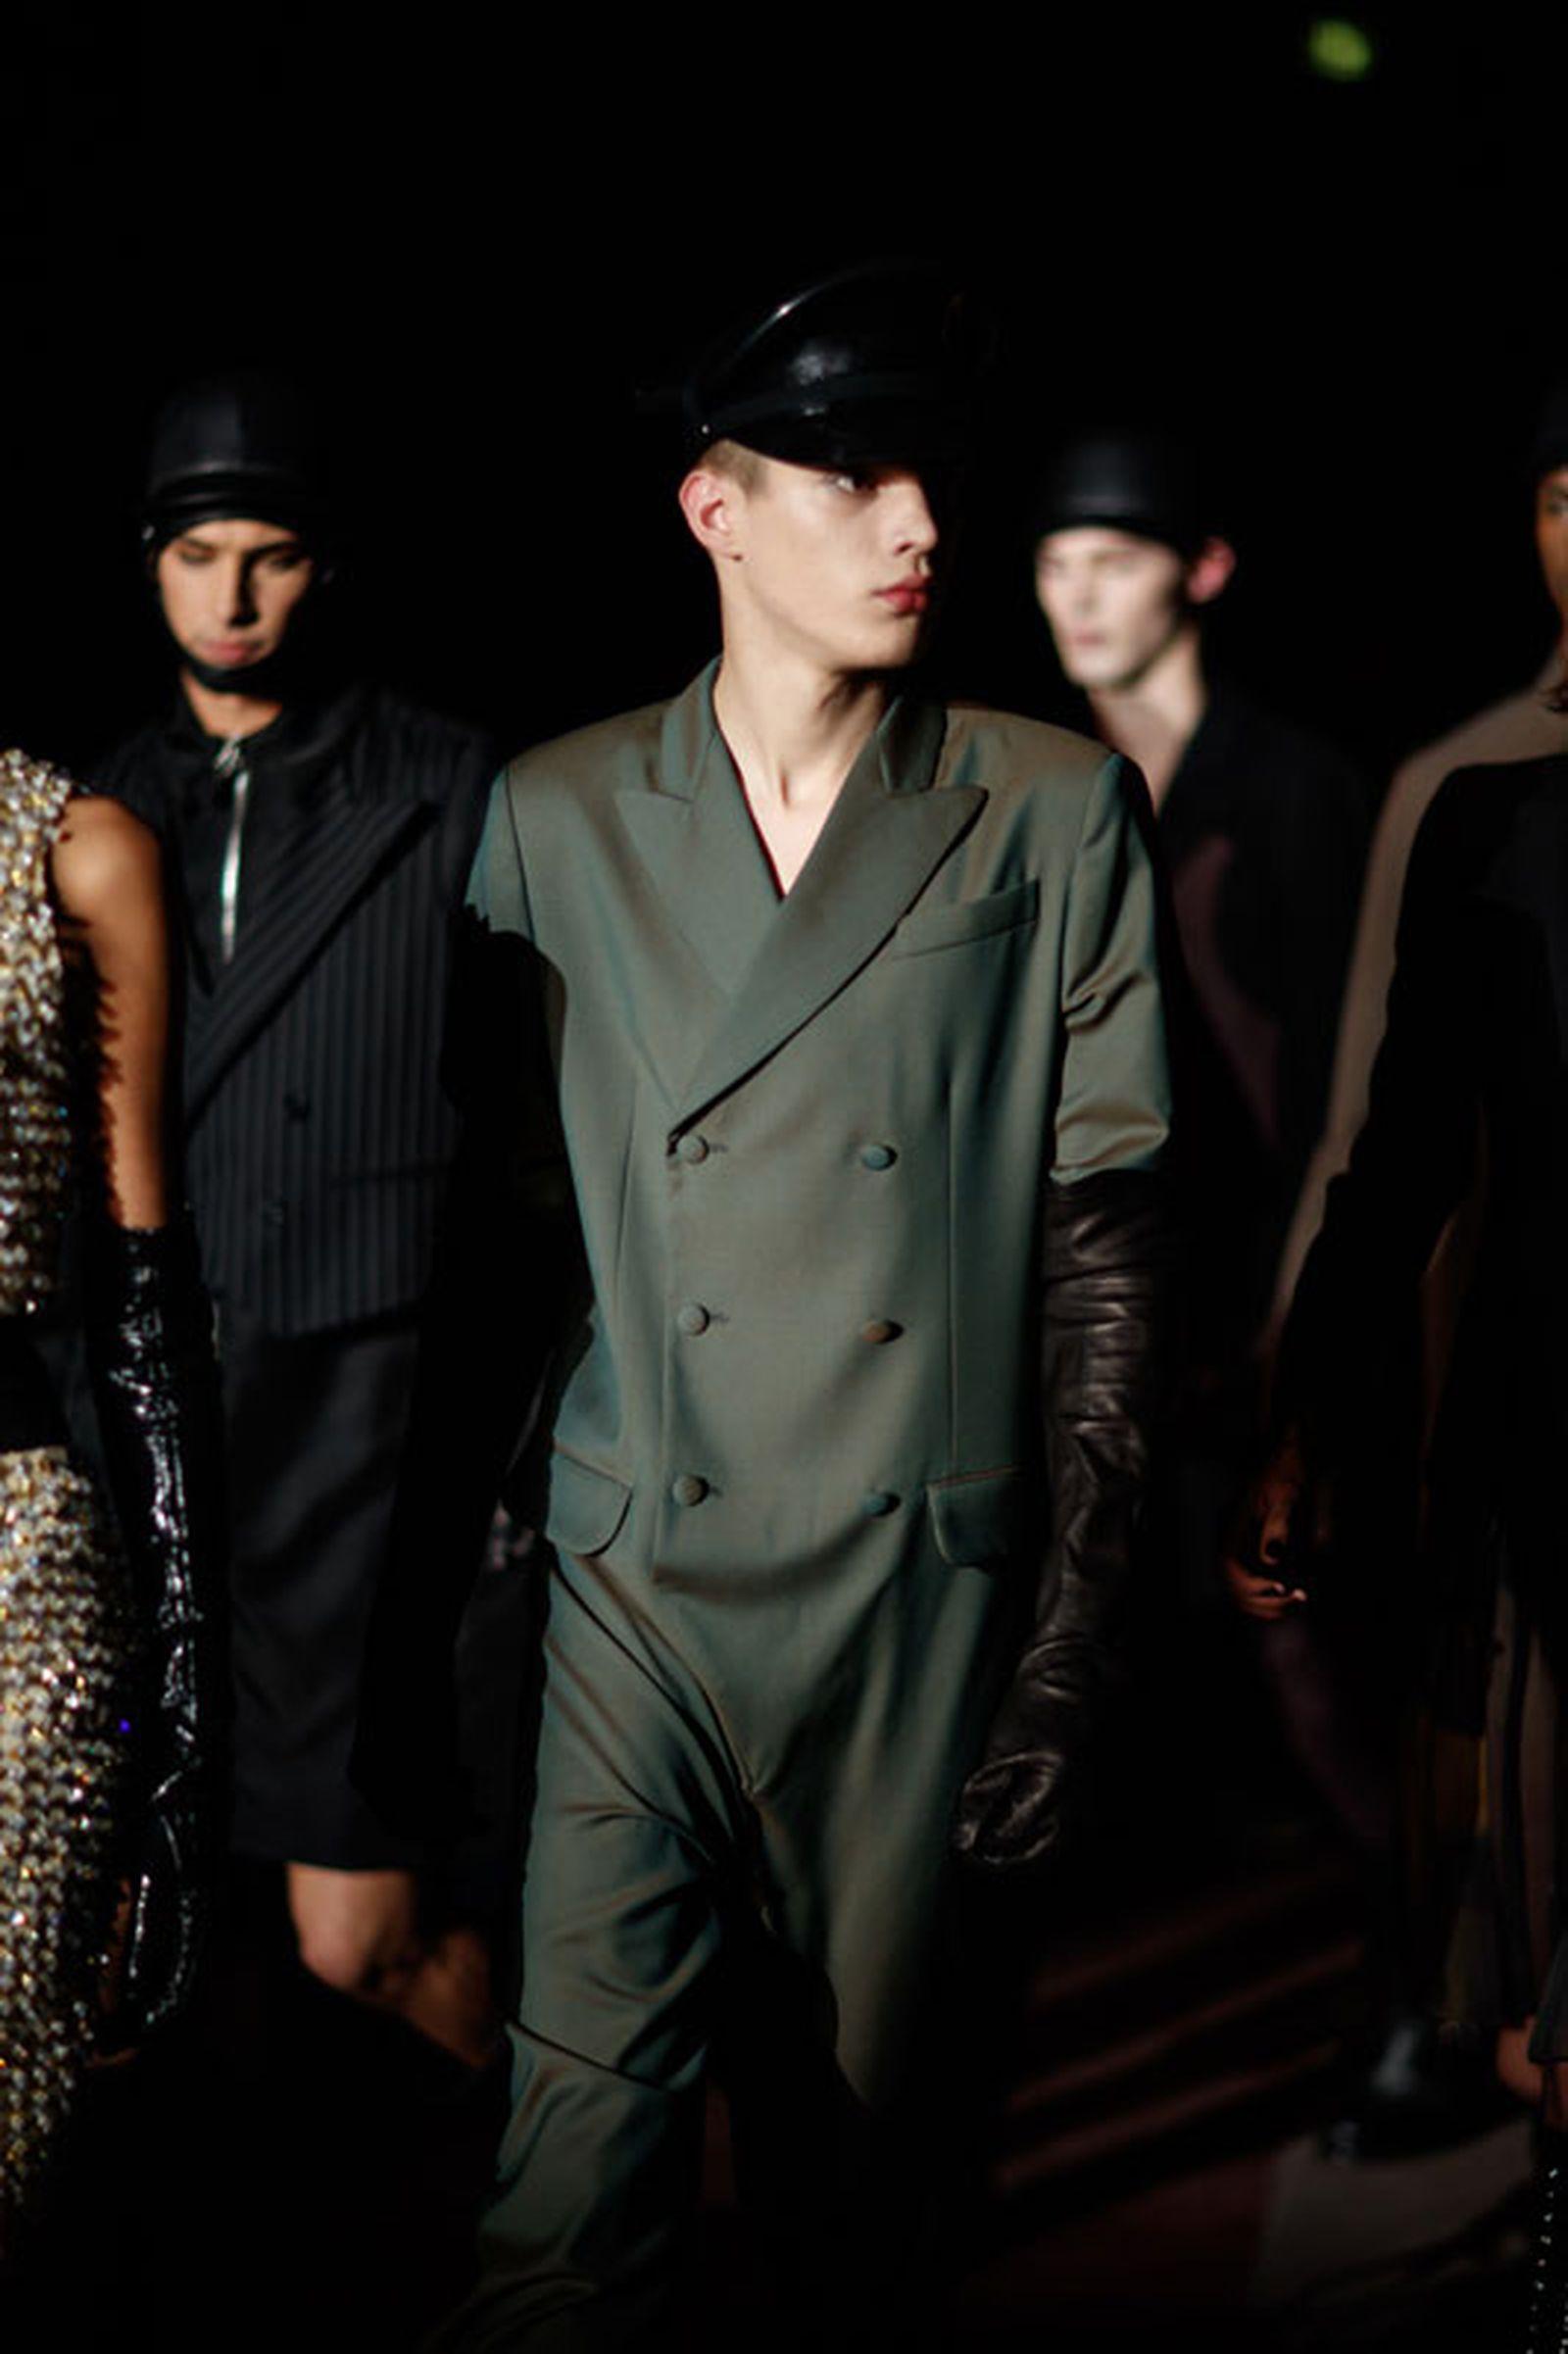 moschino fw18 milan fashion week Fall/WInter 2018 jeremy scott runway